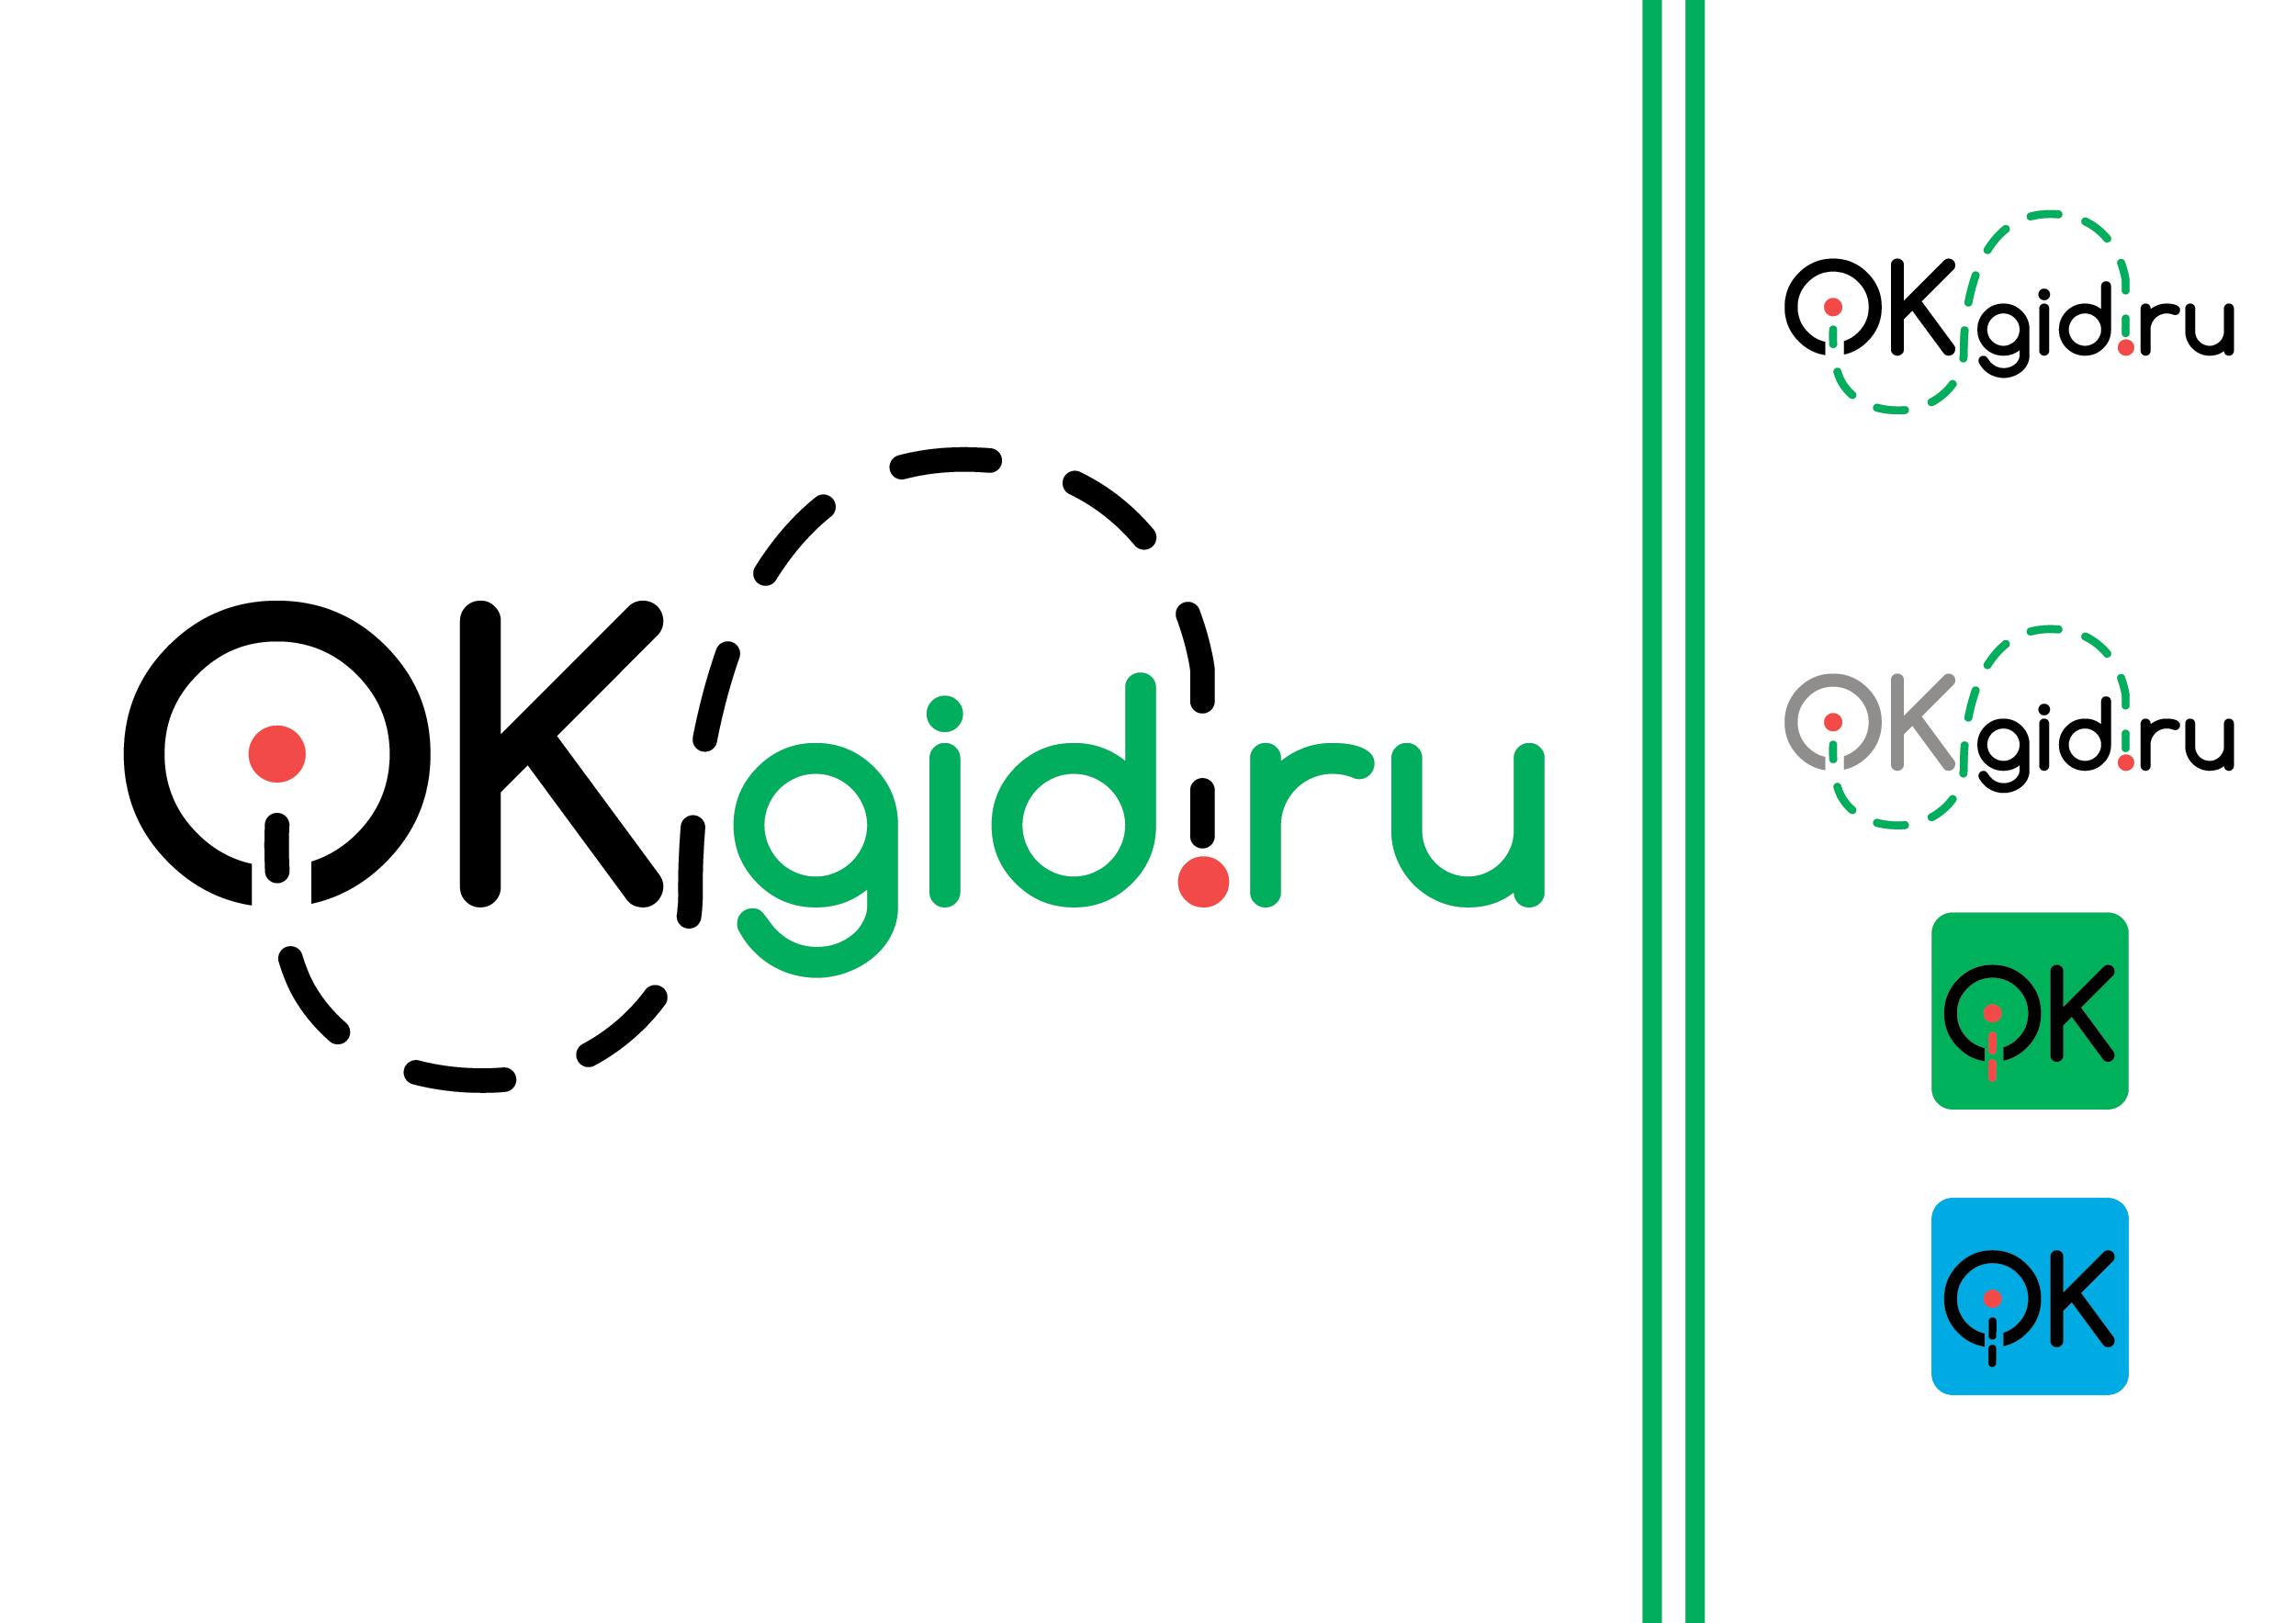 Логотип для сайта OKgid.ru фото f_01957c6f8a42b1a5.png